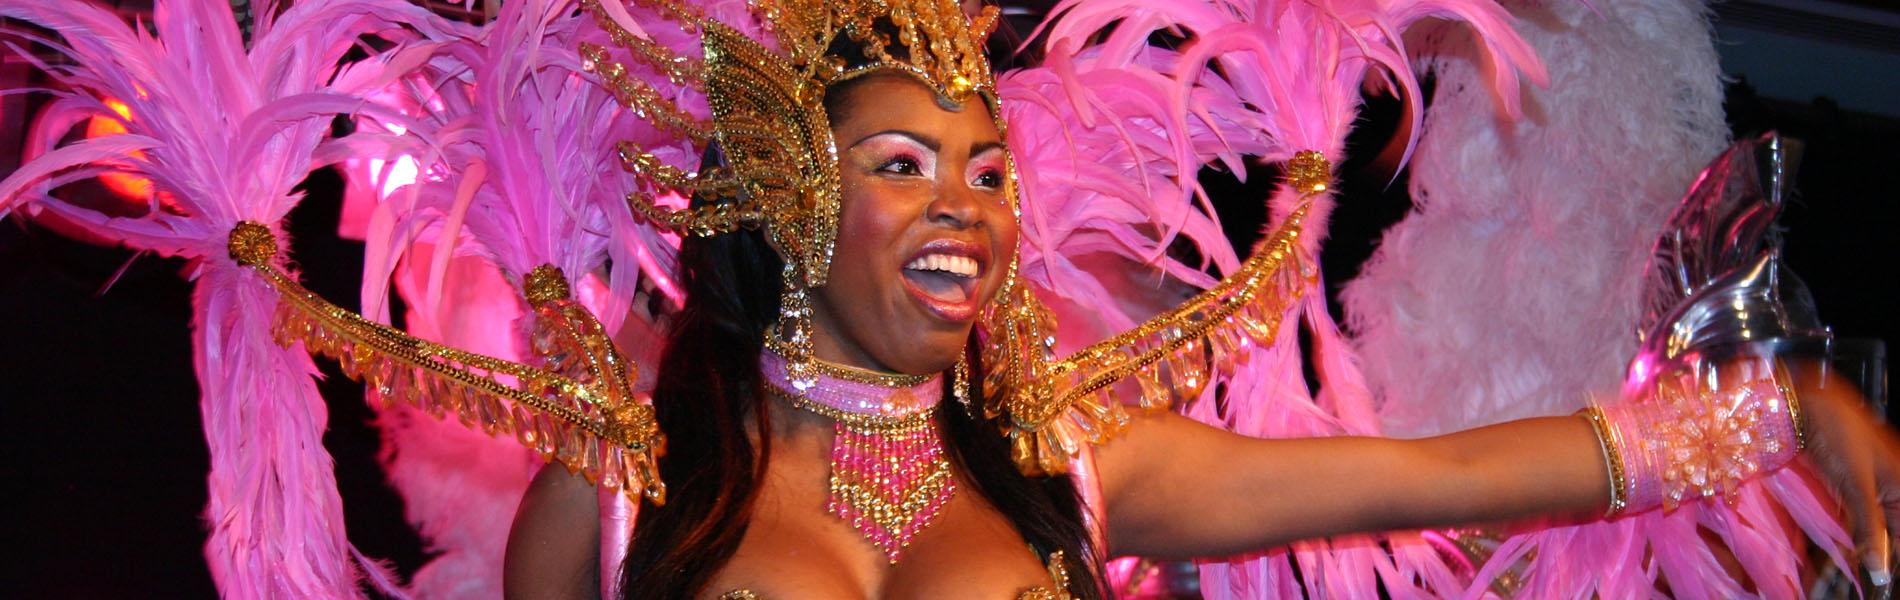 Zuid Amerikaans entertainment Fantasia do Brasil 1 HEADER